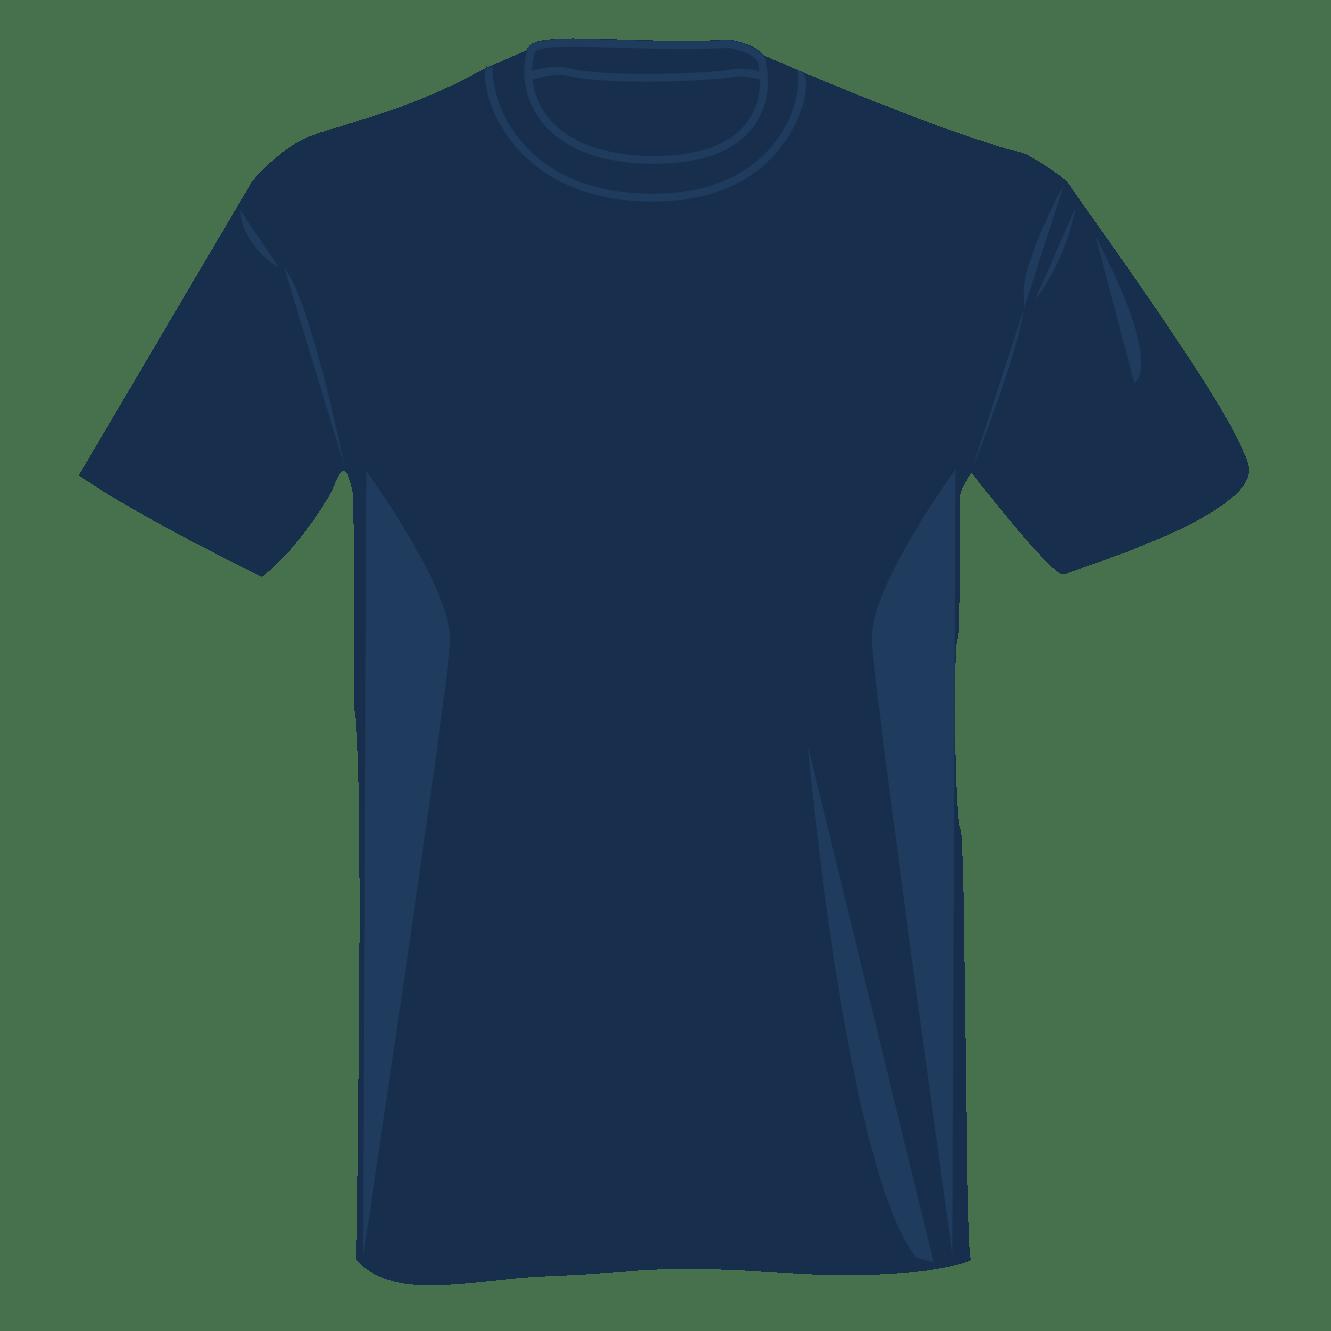 hight resolution of t shirt shirt clip art software free clipart images clipartix